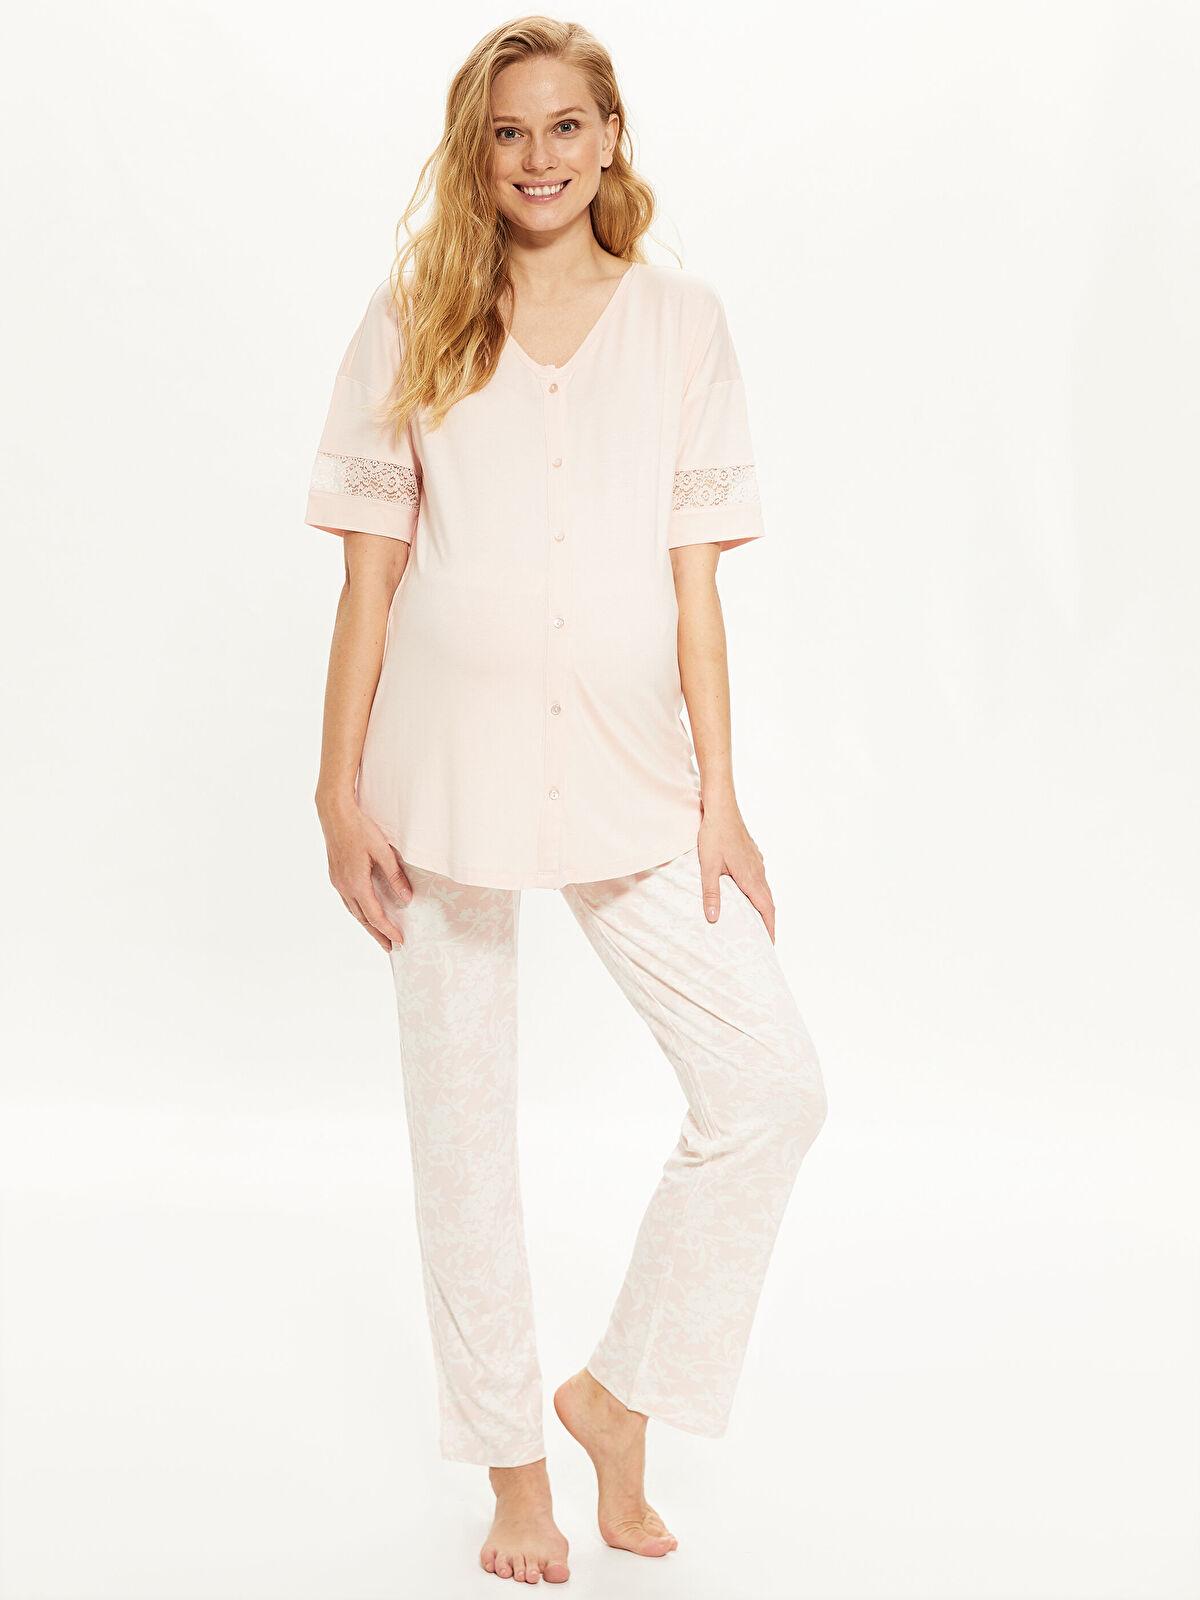 Dantel Detaylı Viskon Hamile  Pijama Takımı - LC WAIKIKI